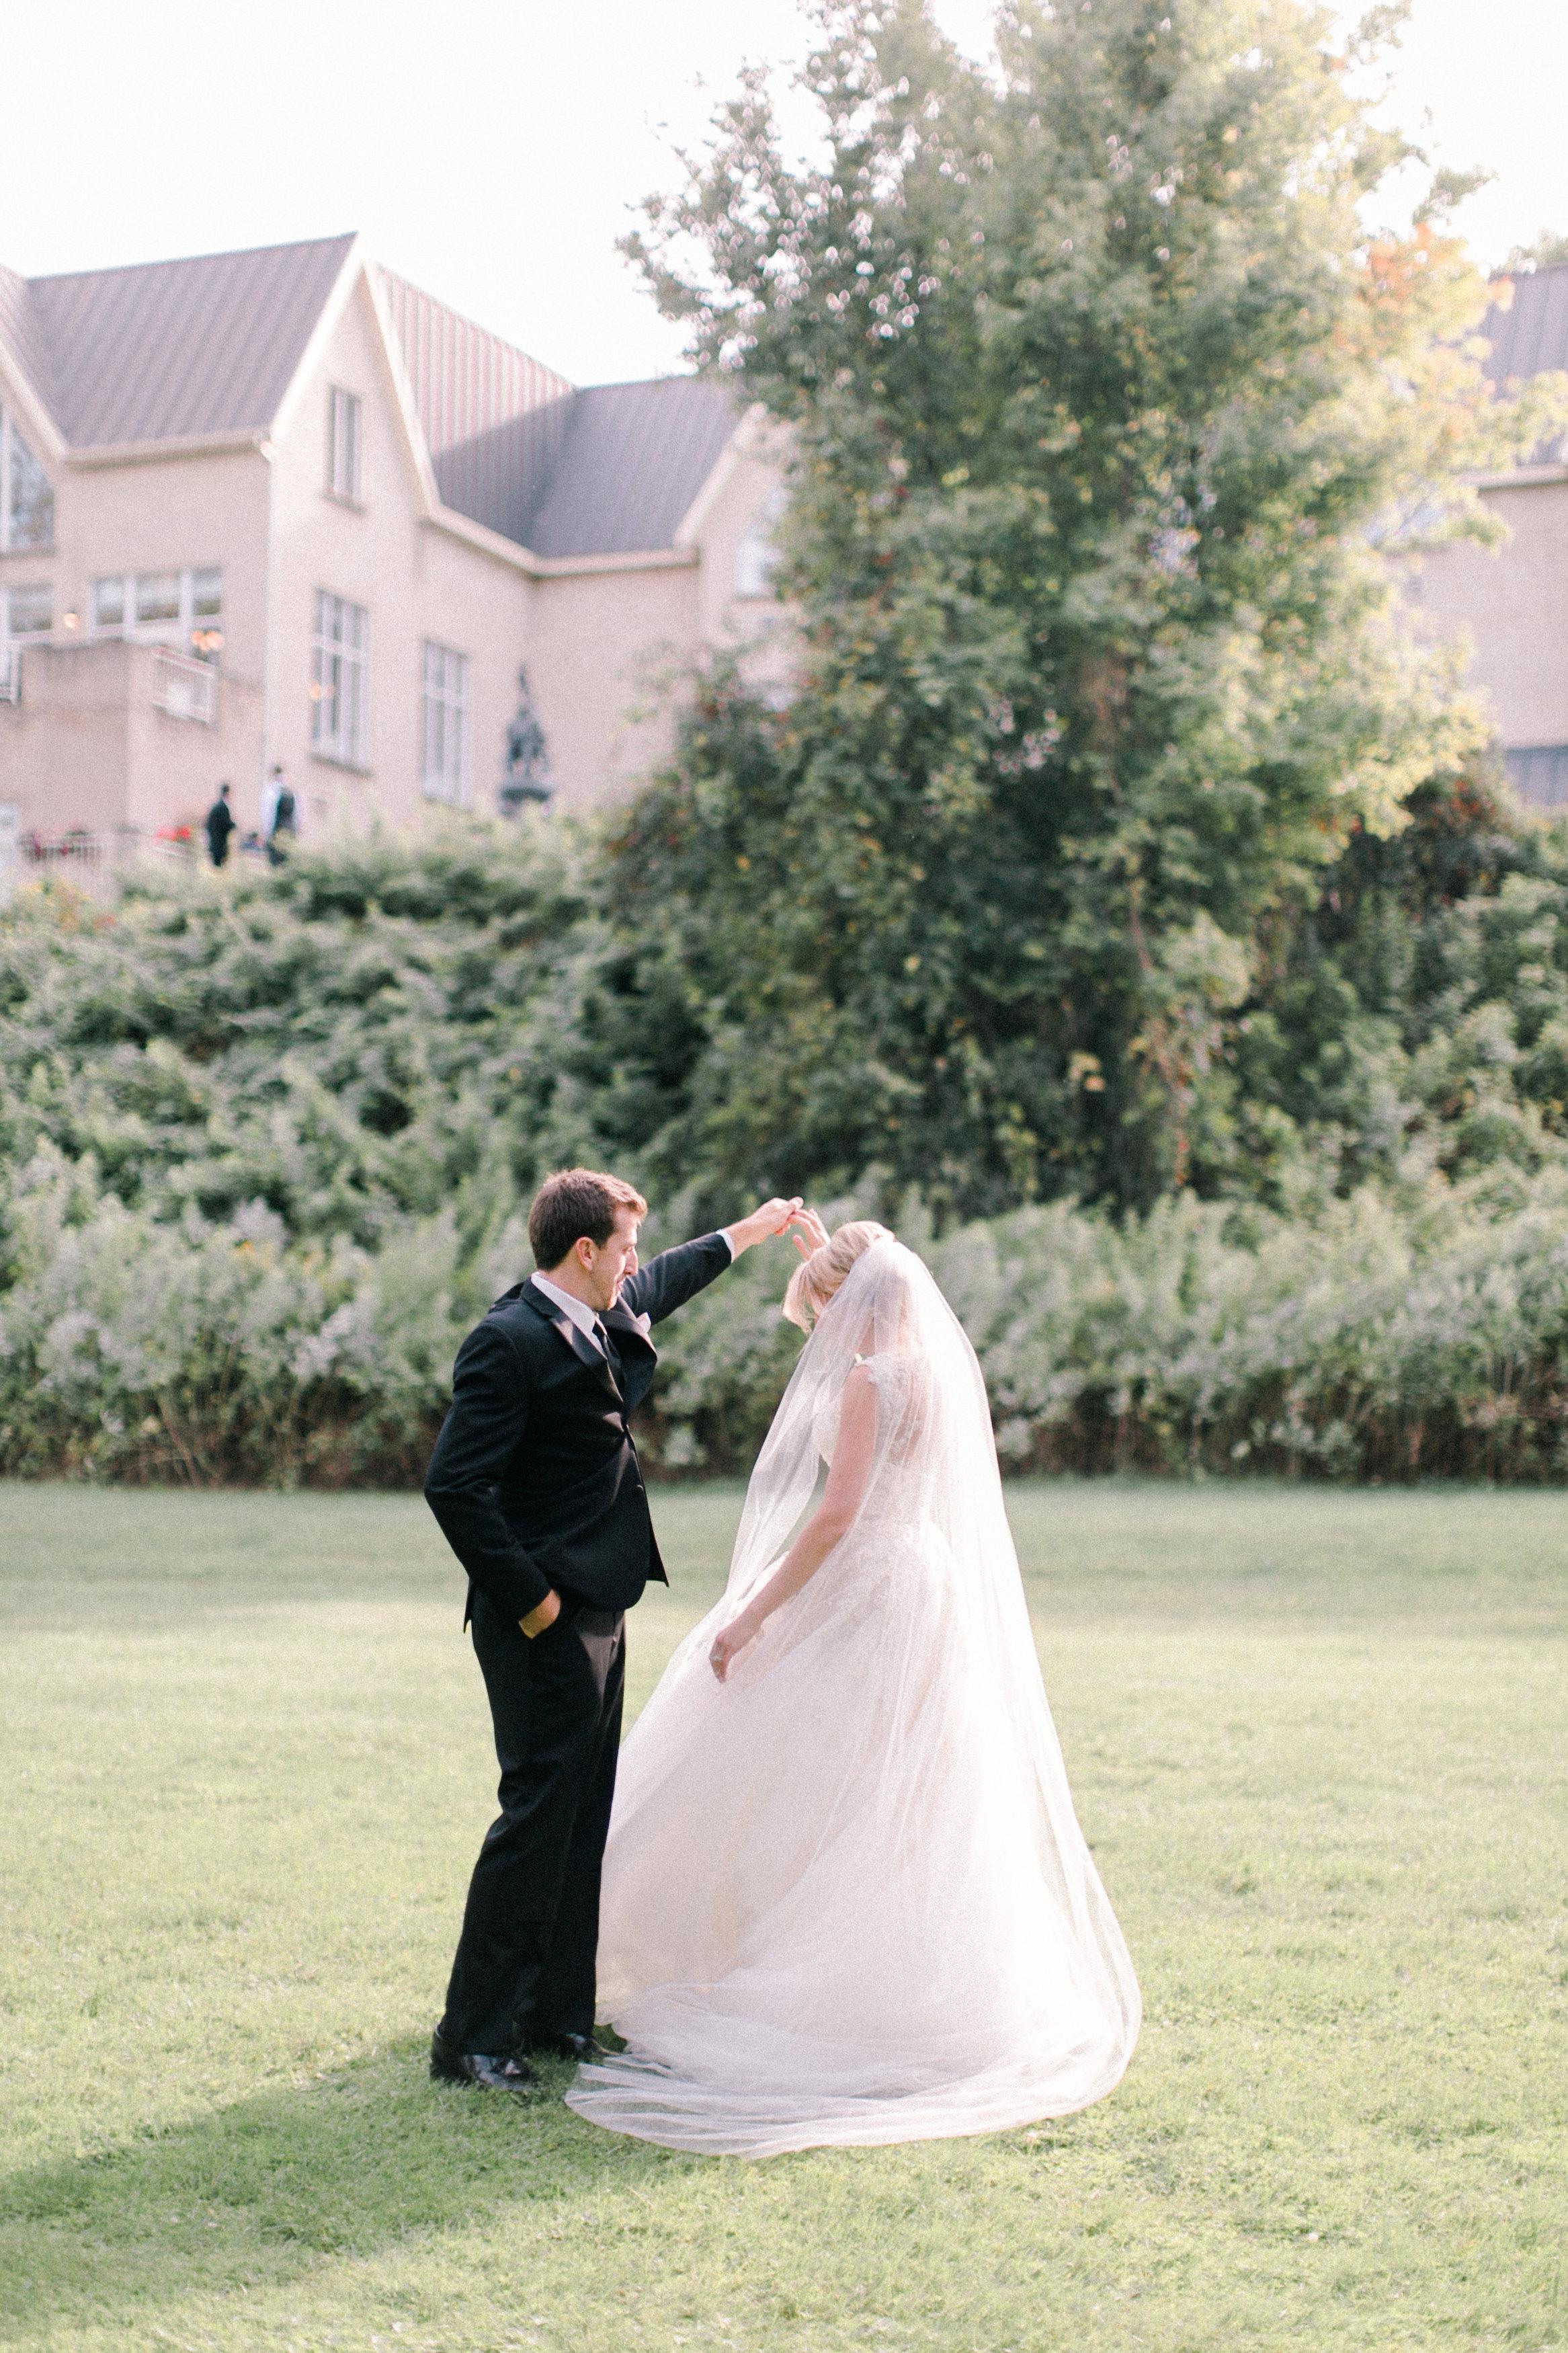 toronto-wedding-photographer-richelle-hunter-ruth-jonathan-565.jpg